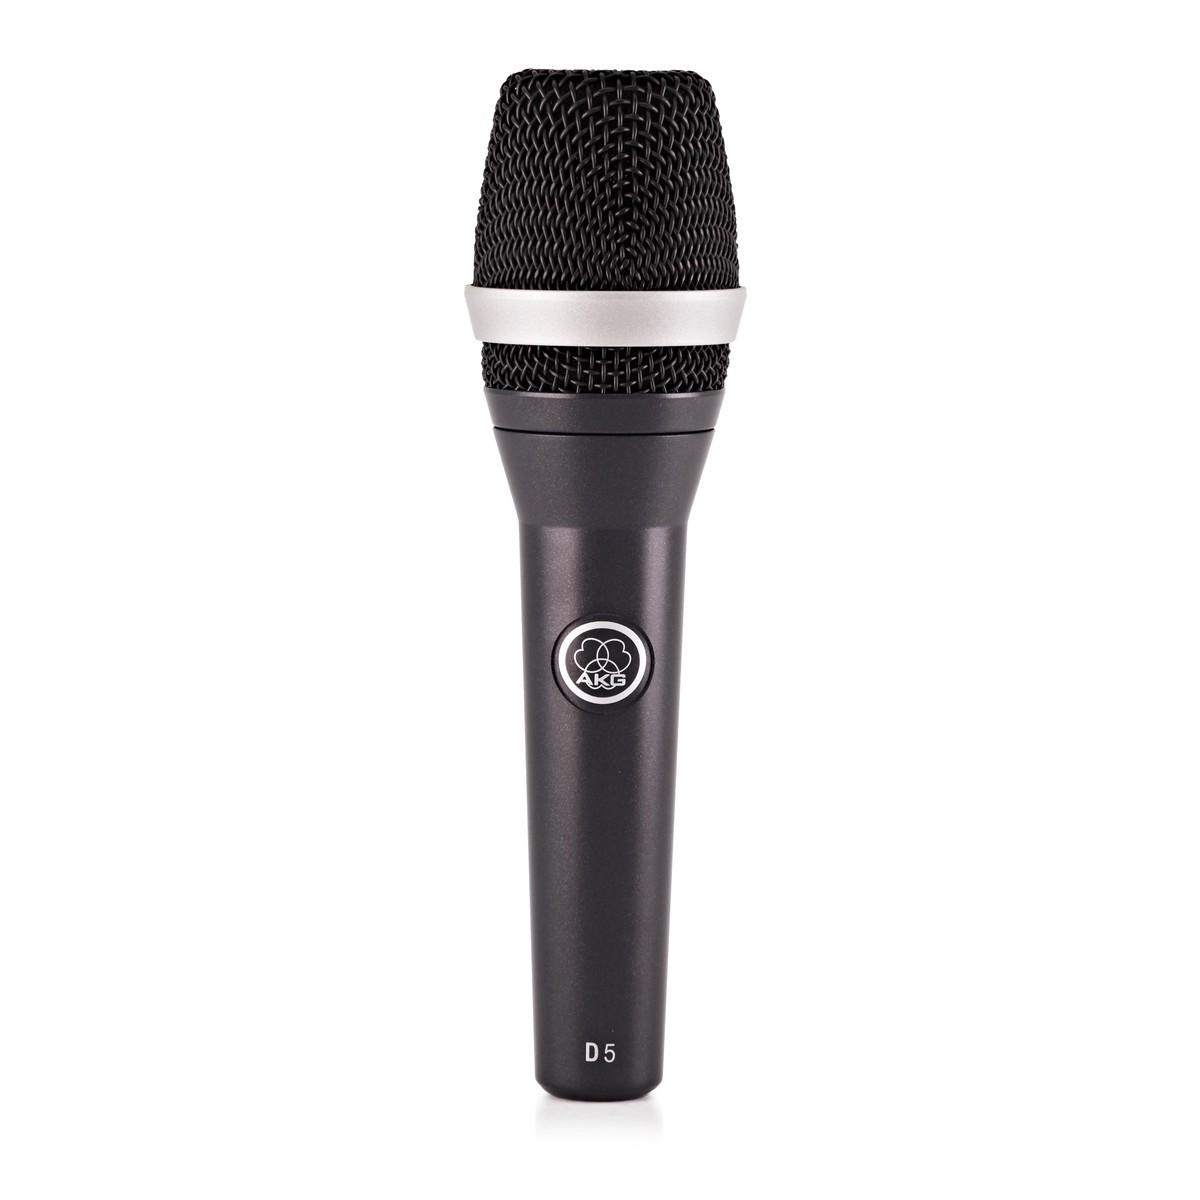 AKG D5 Dynamic Vocal Microphone